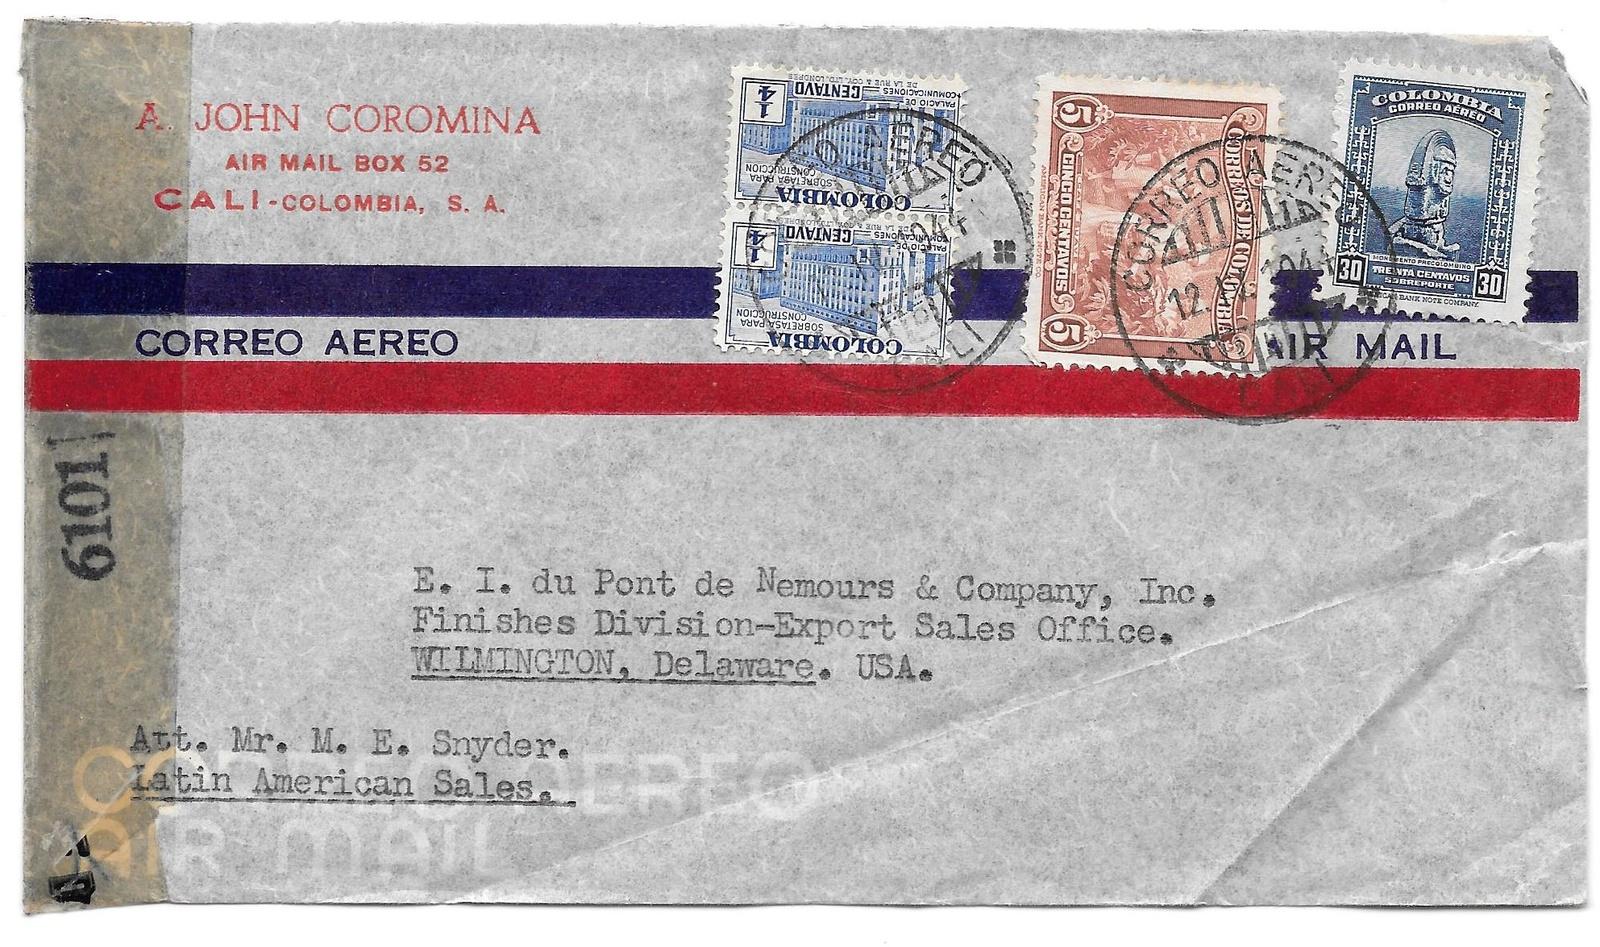 99 br 132 315 censored colombia john coromina 1944 air mail